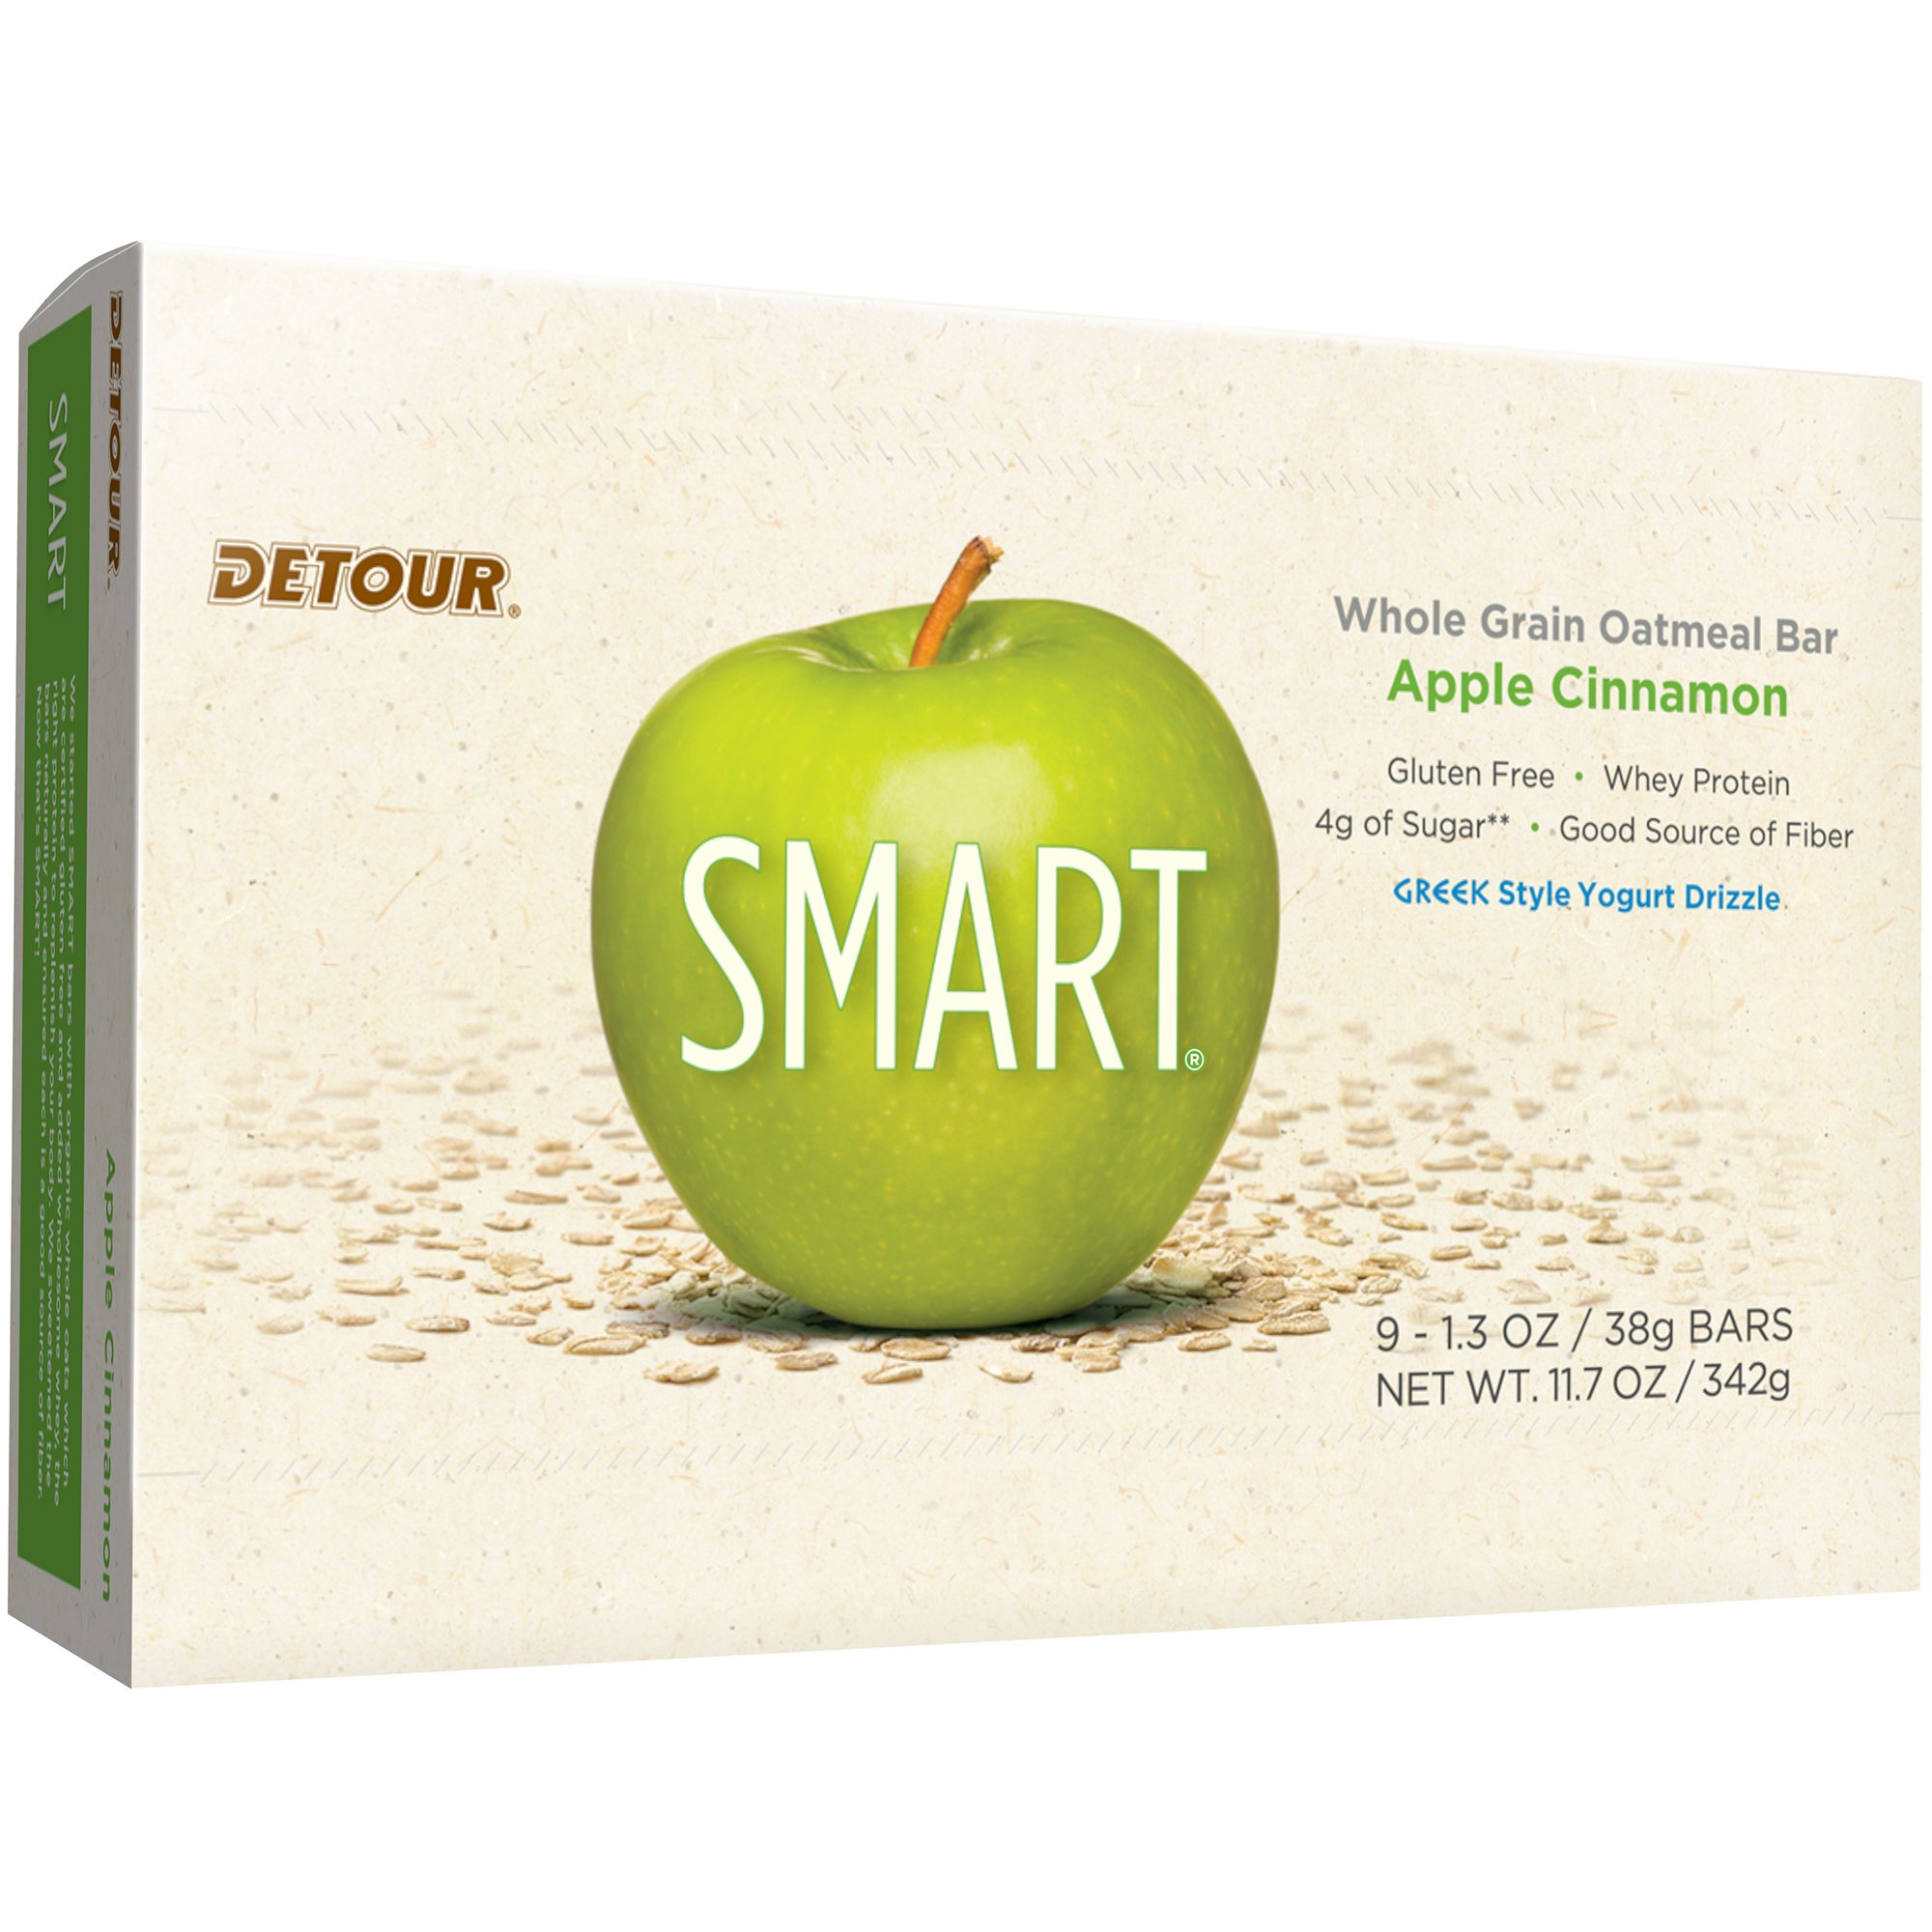 Detour Smart Gluten Free Oatmeal Bar, Apple Cinnamon, 11.7 Ounce, 9 Count by Detour